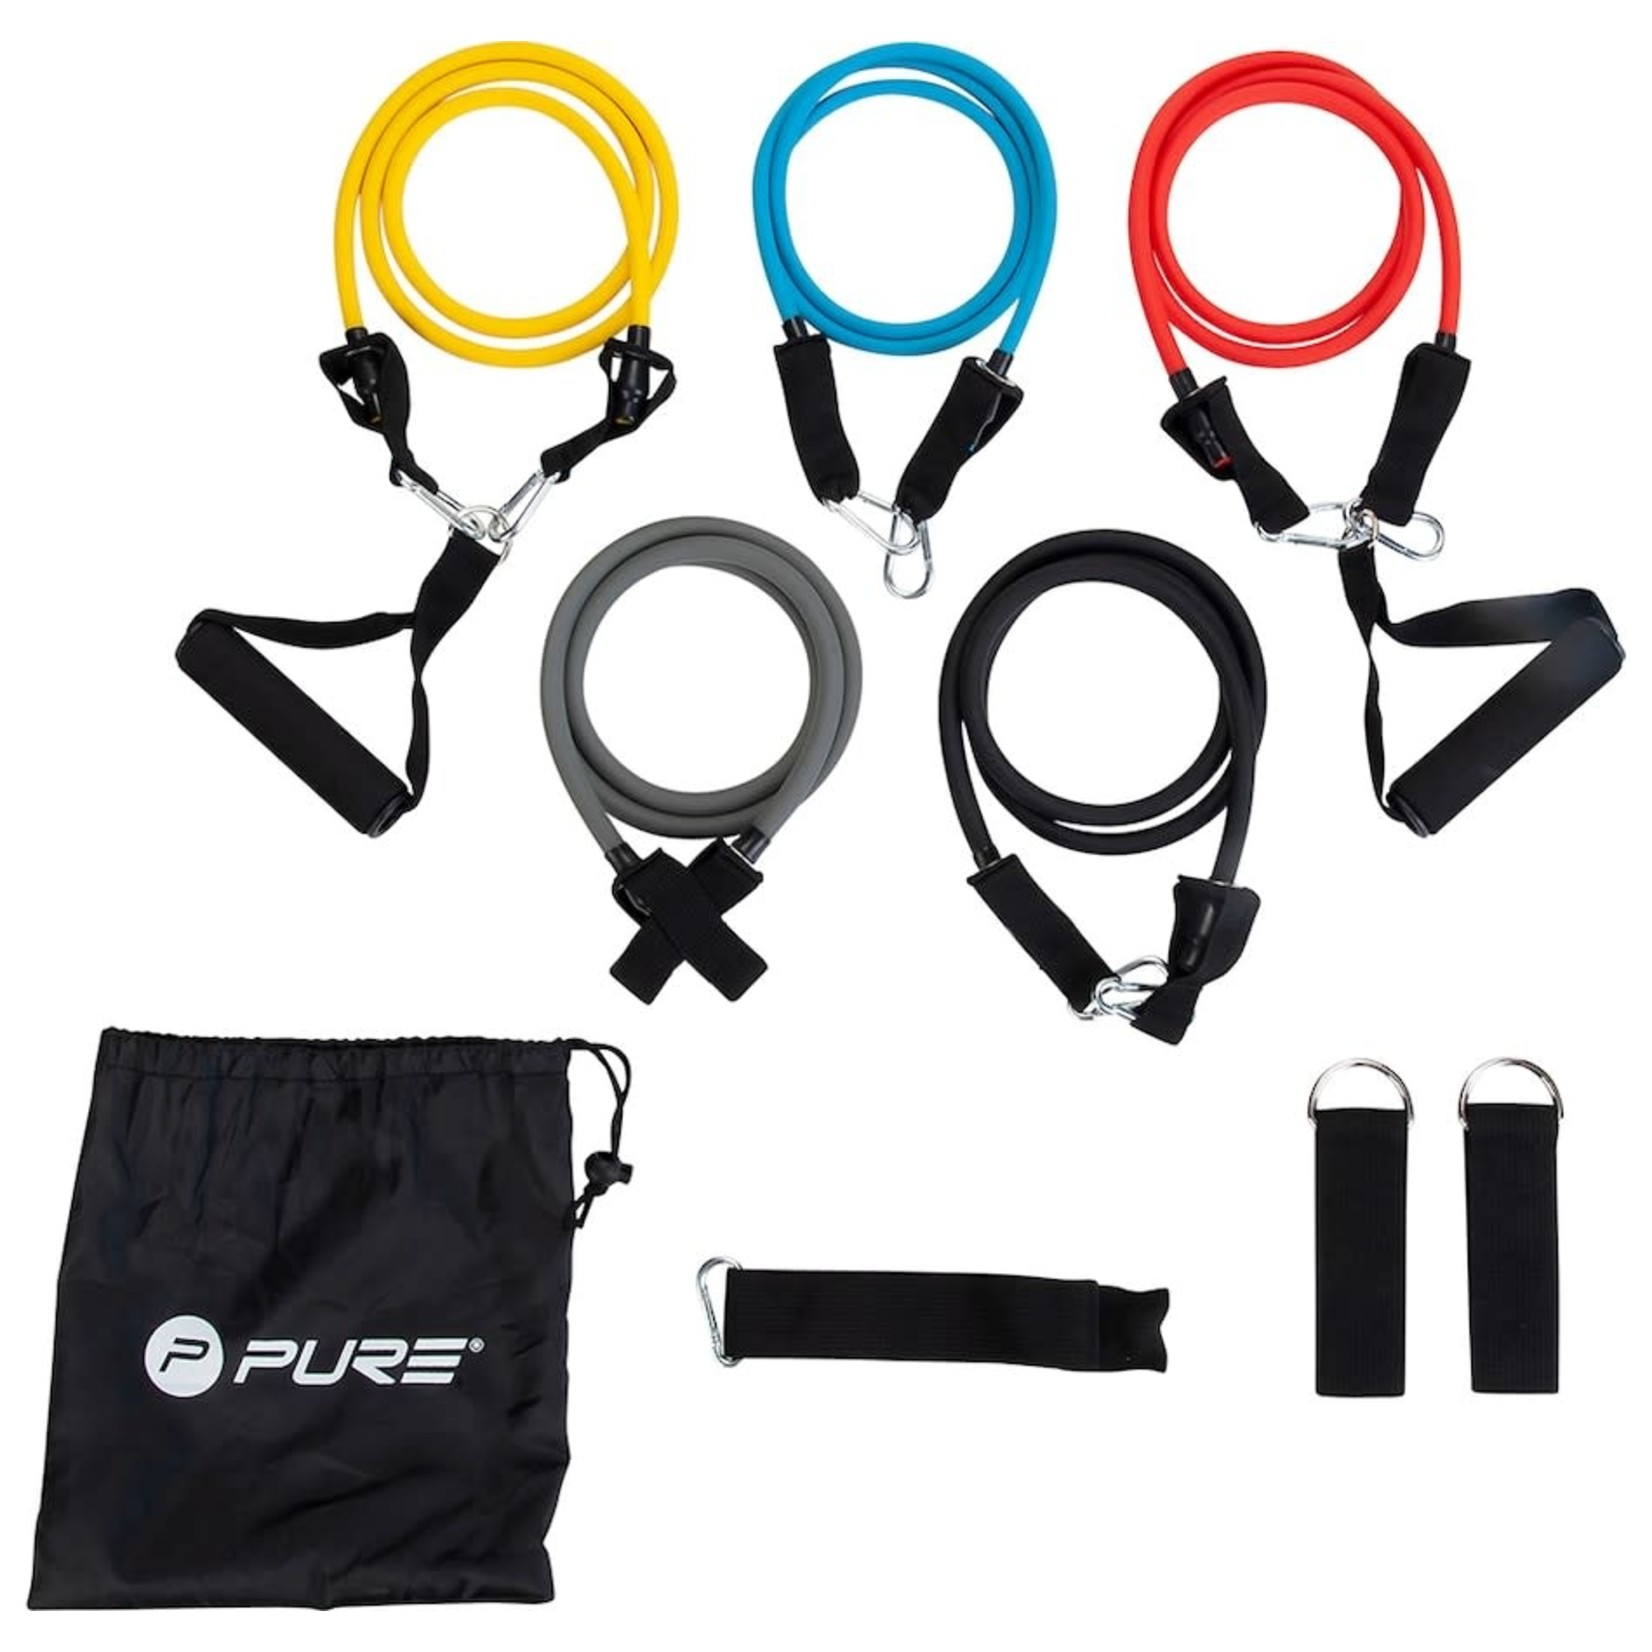 Pure 2Improve Pure 2Improve Exercise Tube Set